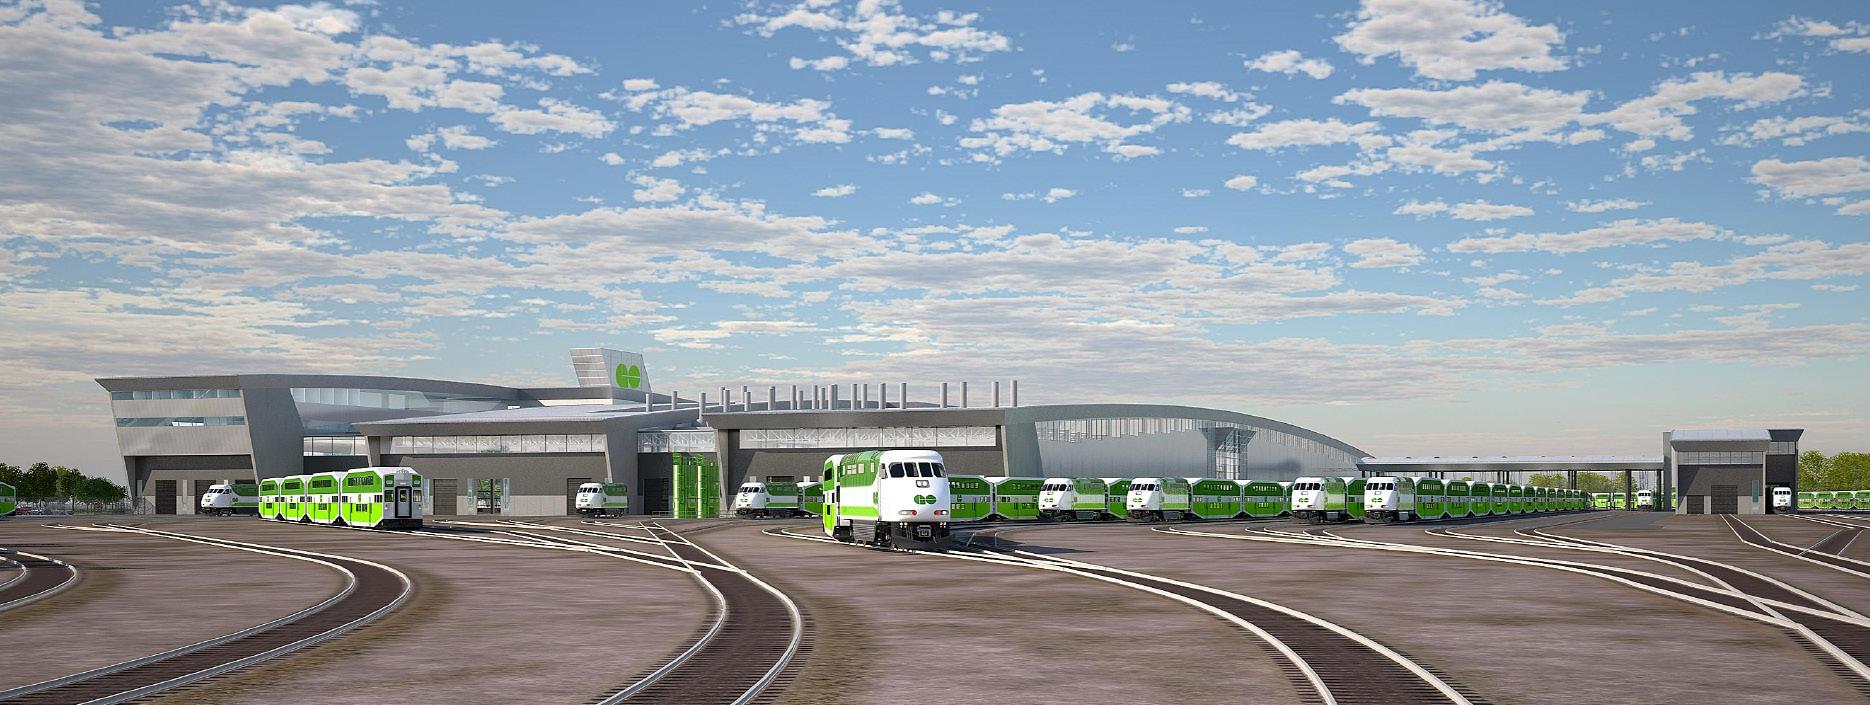 GO Transit: East Rail Maintenance Facilities - Strasman Architects Inc.